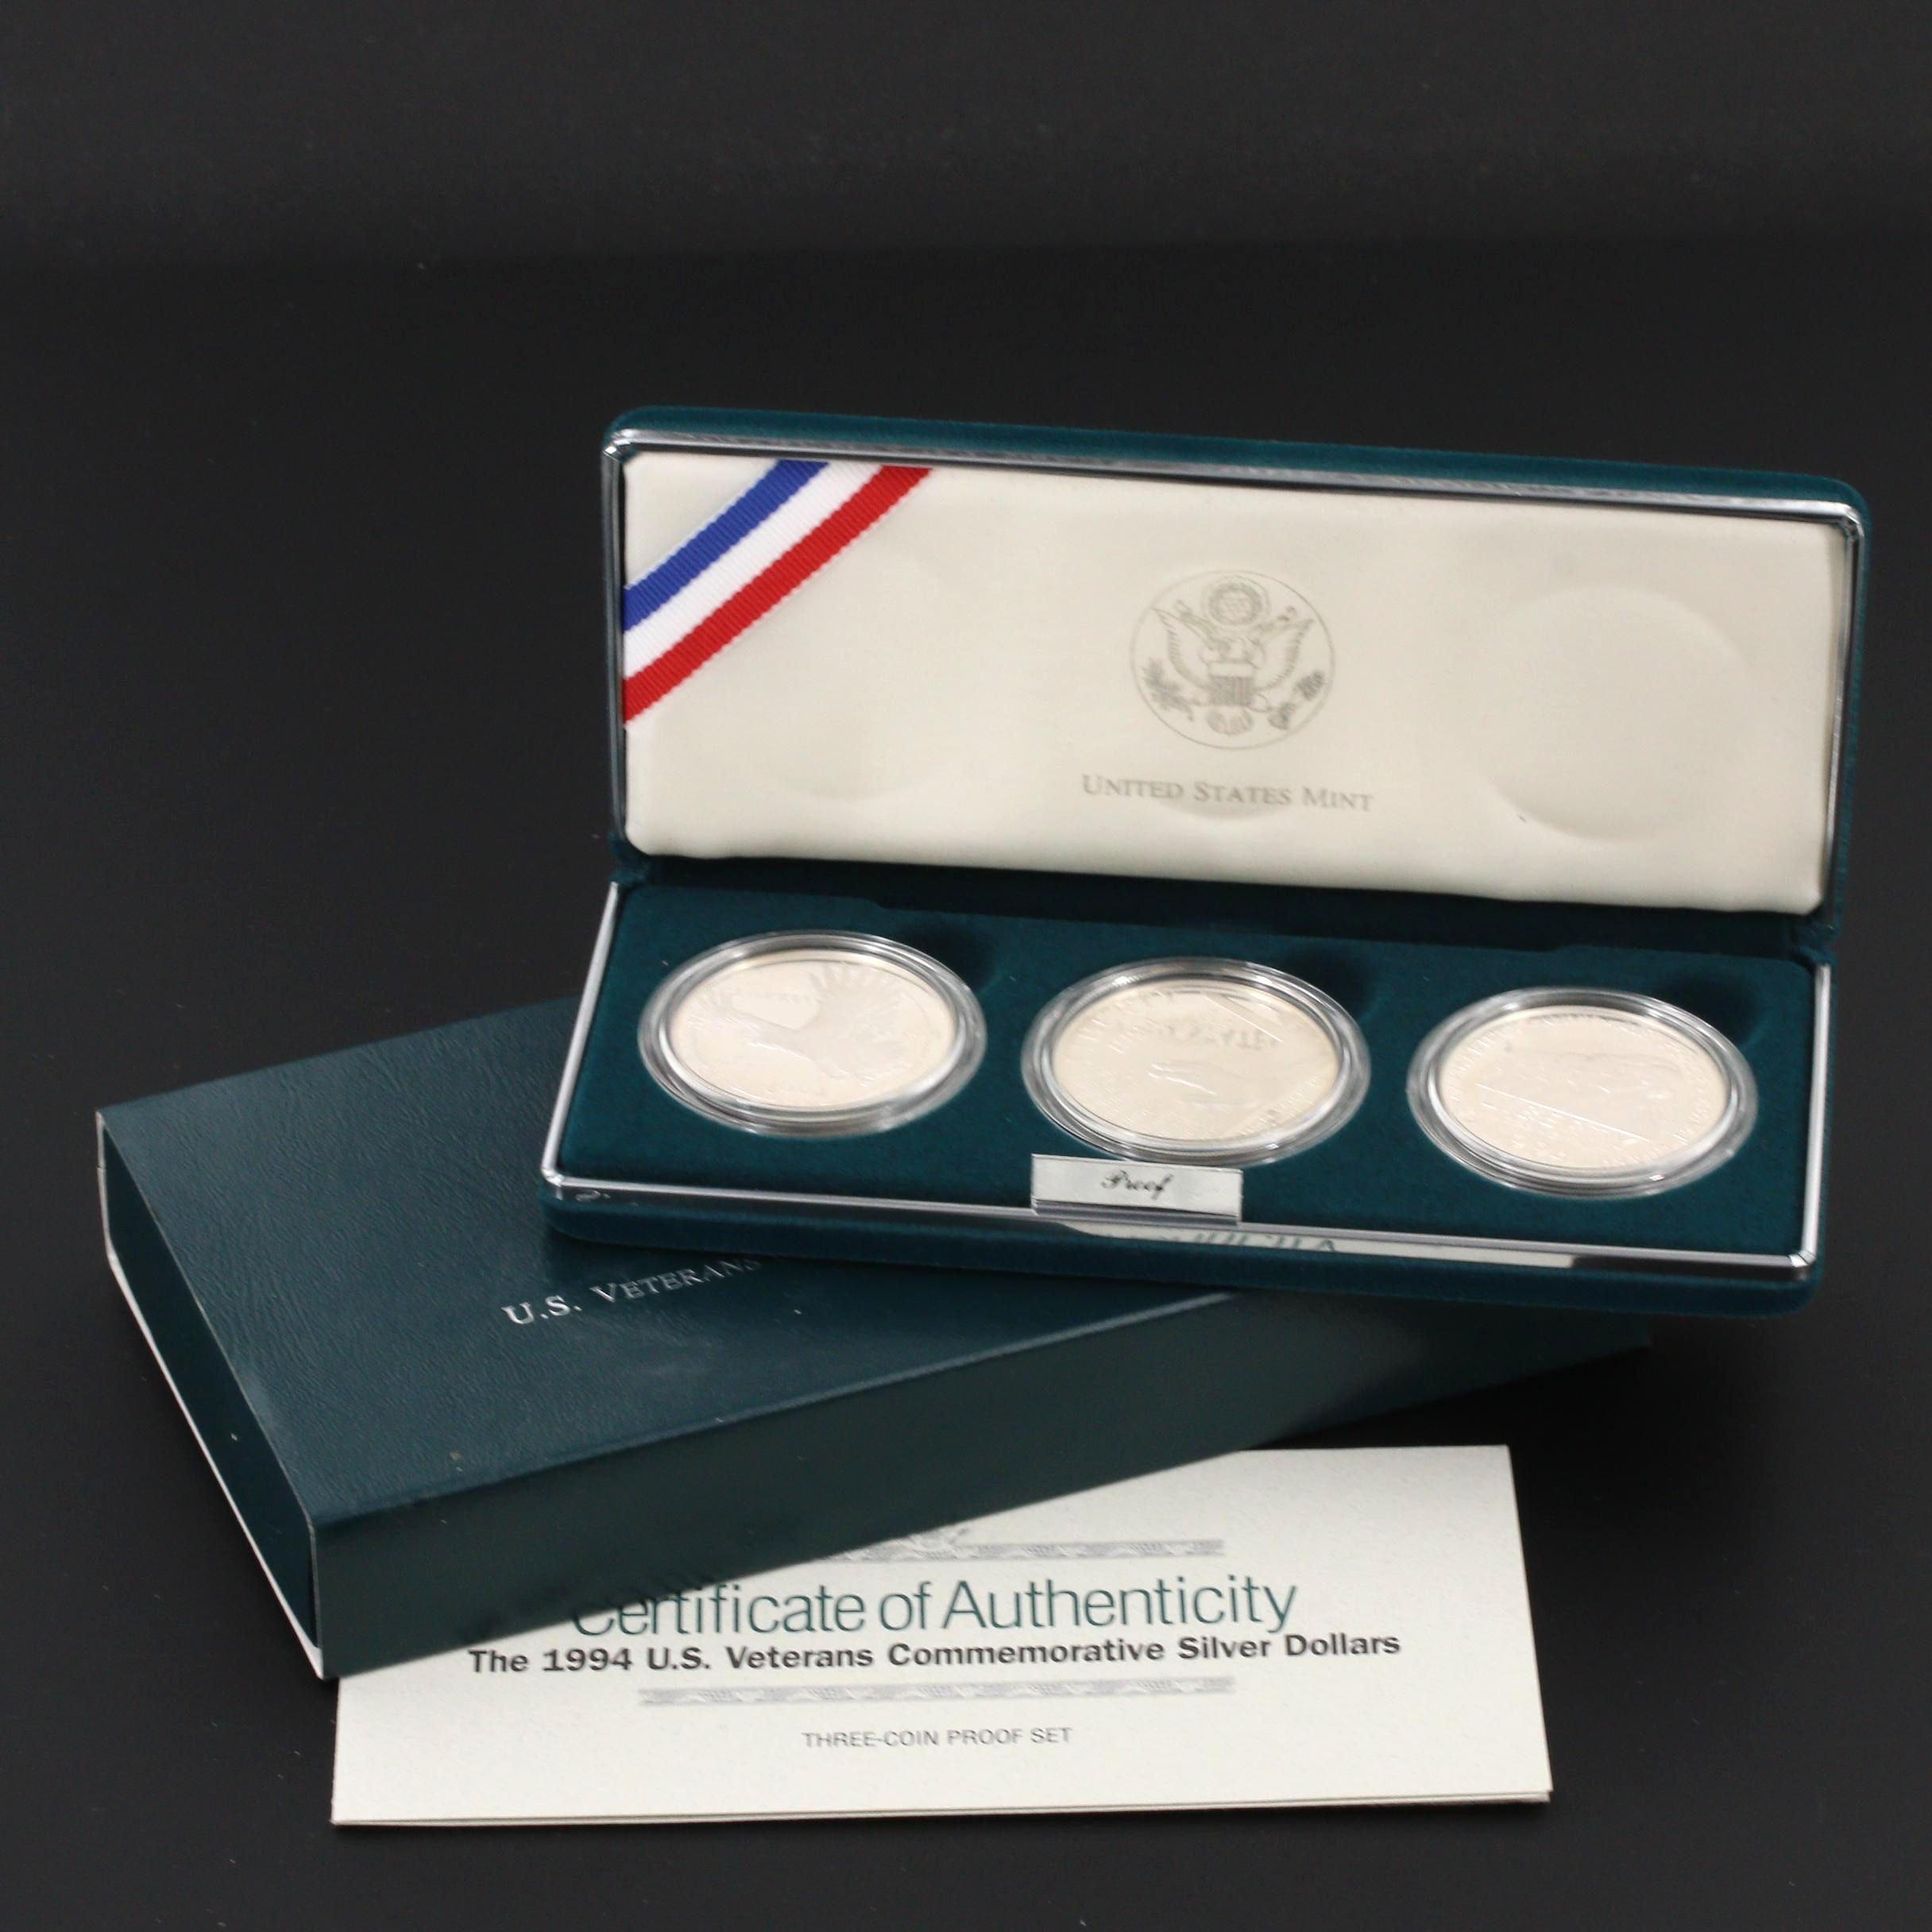 """U.S. Veterans Commemorative Silver Dollars"" Three-Coin U.S. Mint Proof Set"